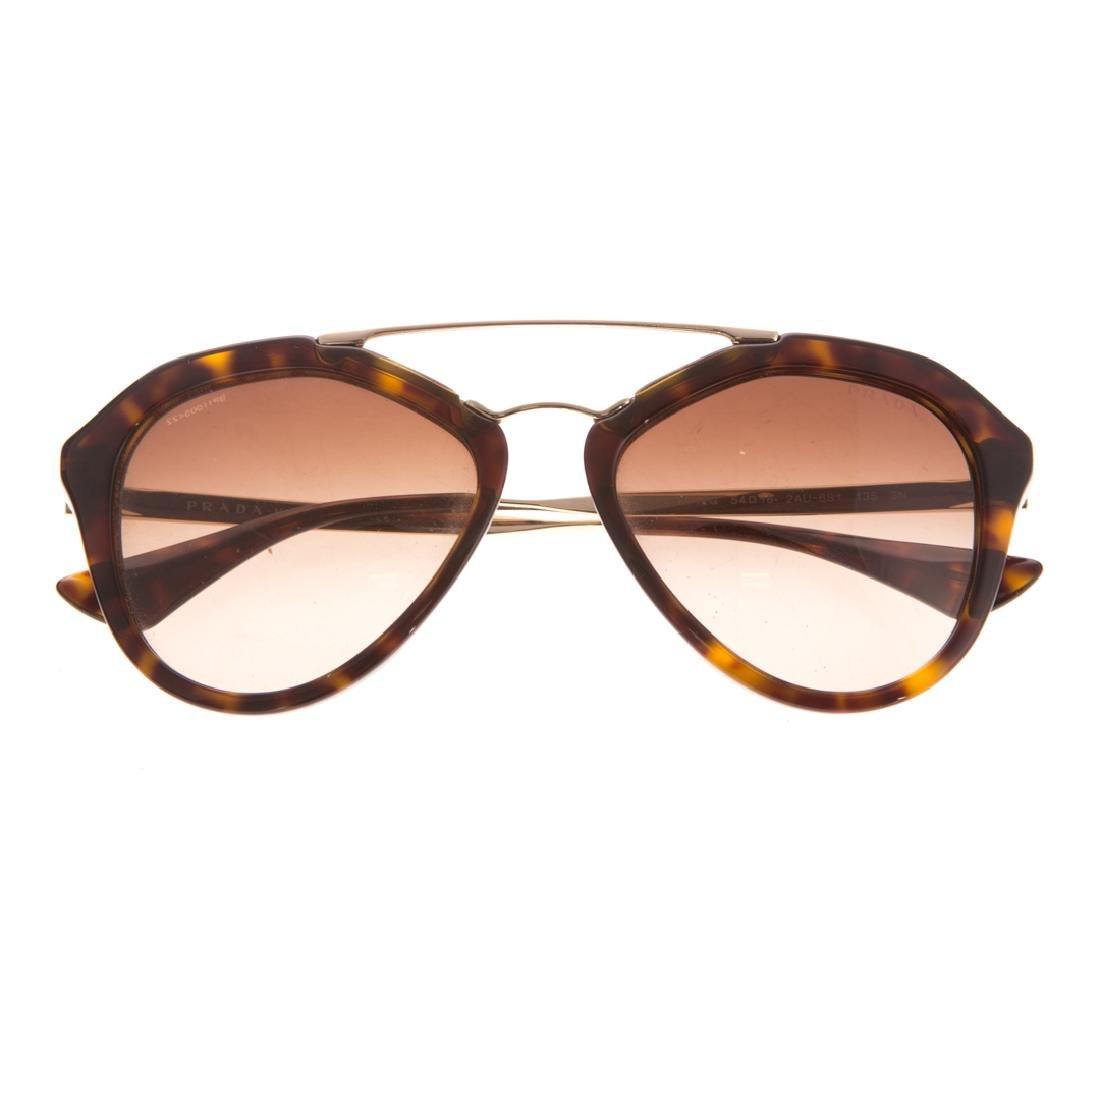 A Pair of Lady's Prada Aviator Sunglasses